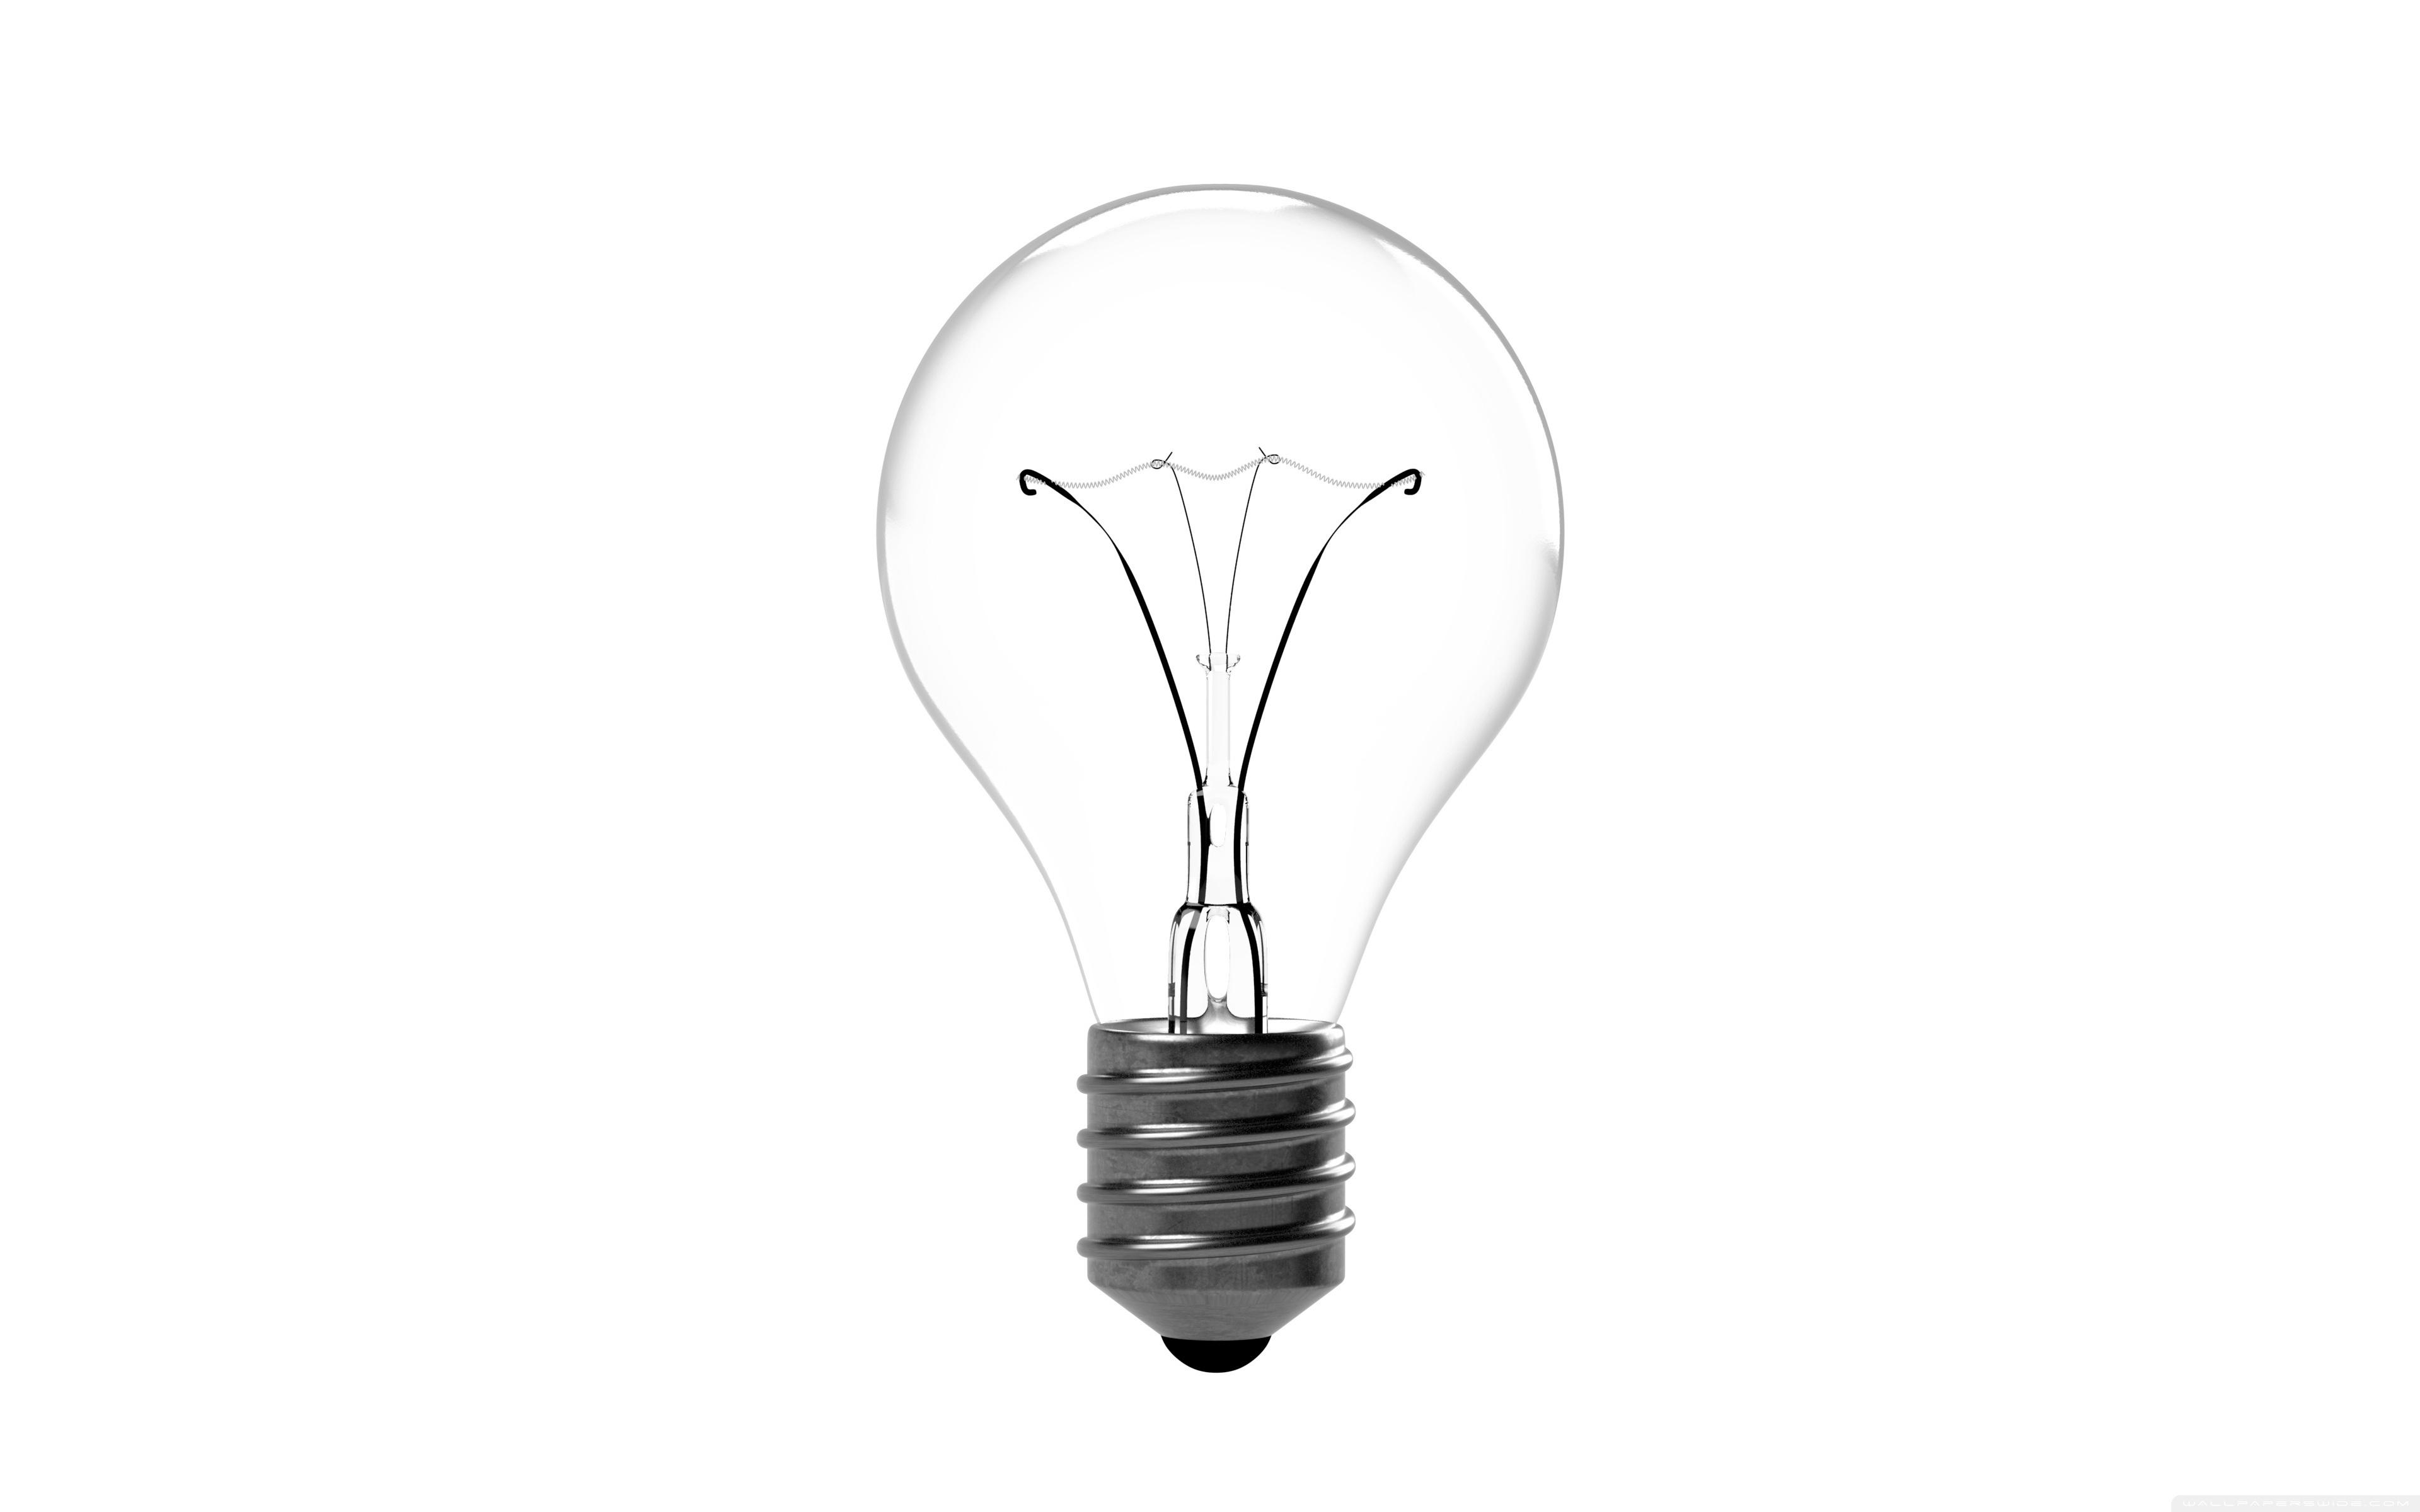 â White Hd Desktop Wallpapers For 4k Ultra Hd Light Bulb